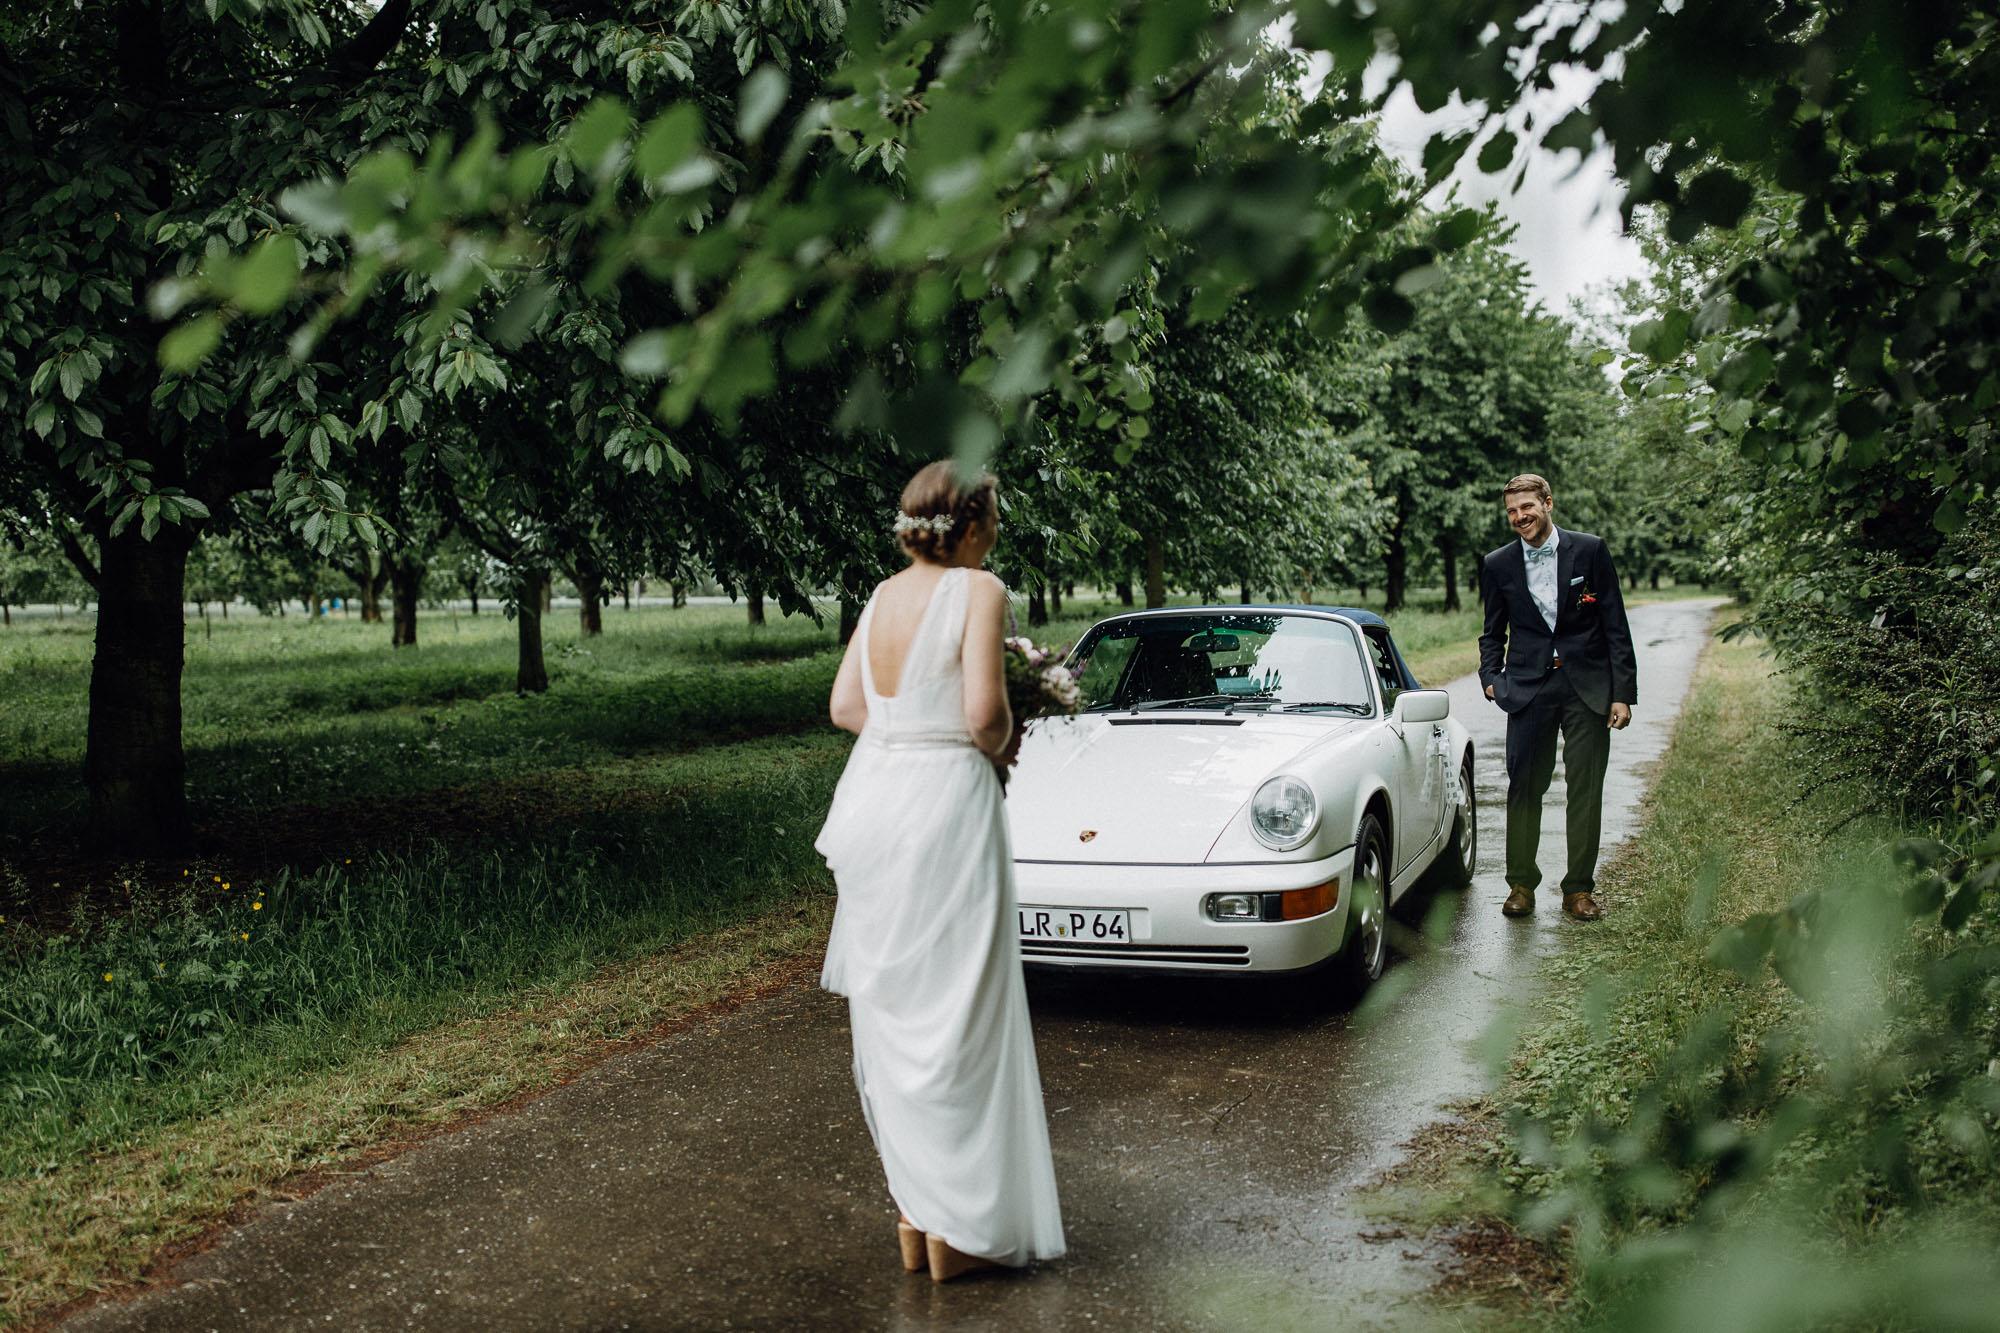 raissa simon photography destination wedding munich black forest offenburg 010 - Claudia + Christoph